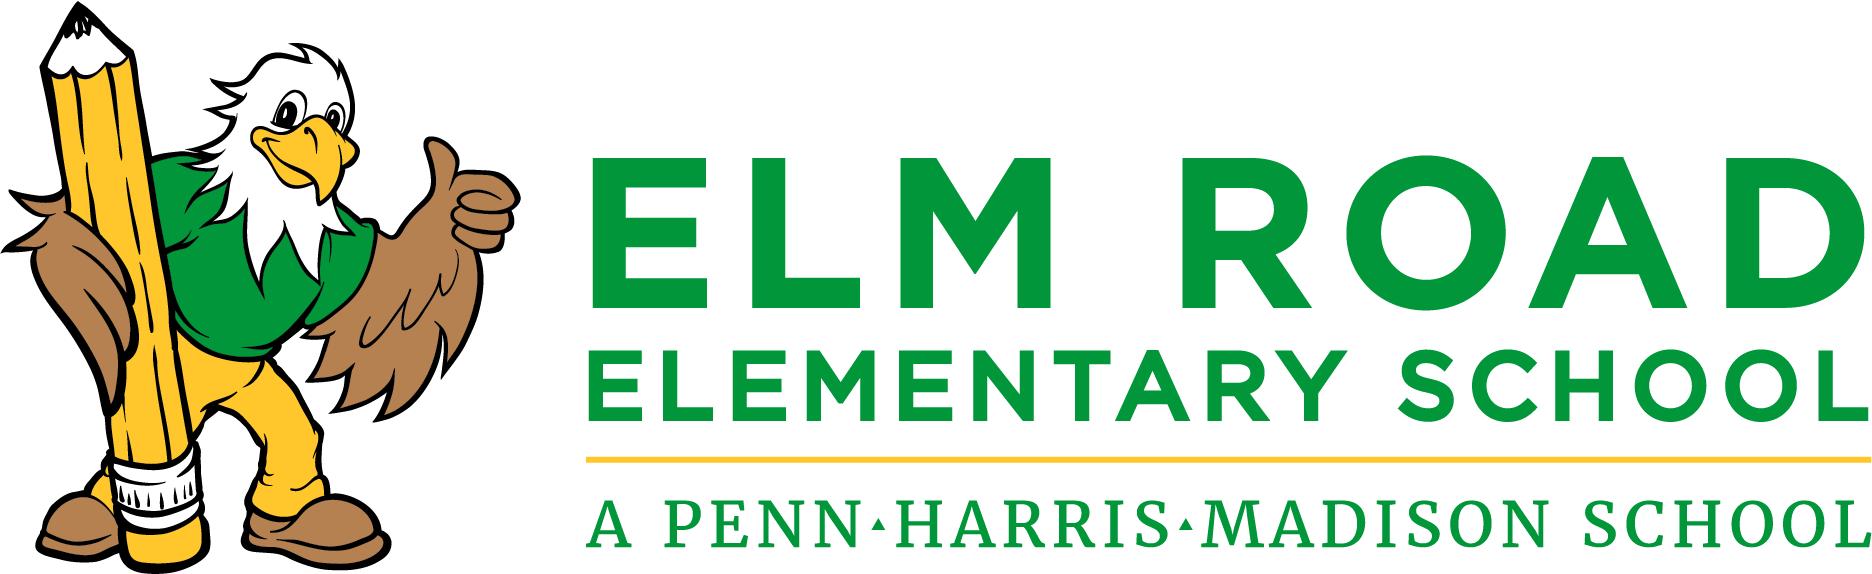 Elm Road Elementary School